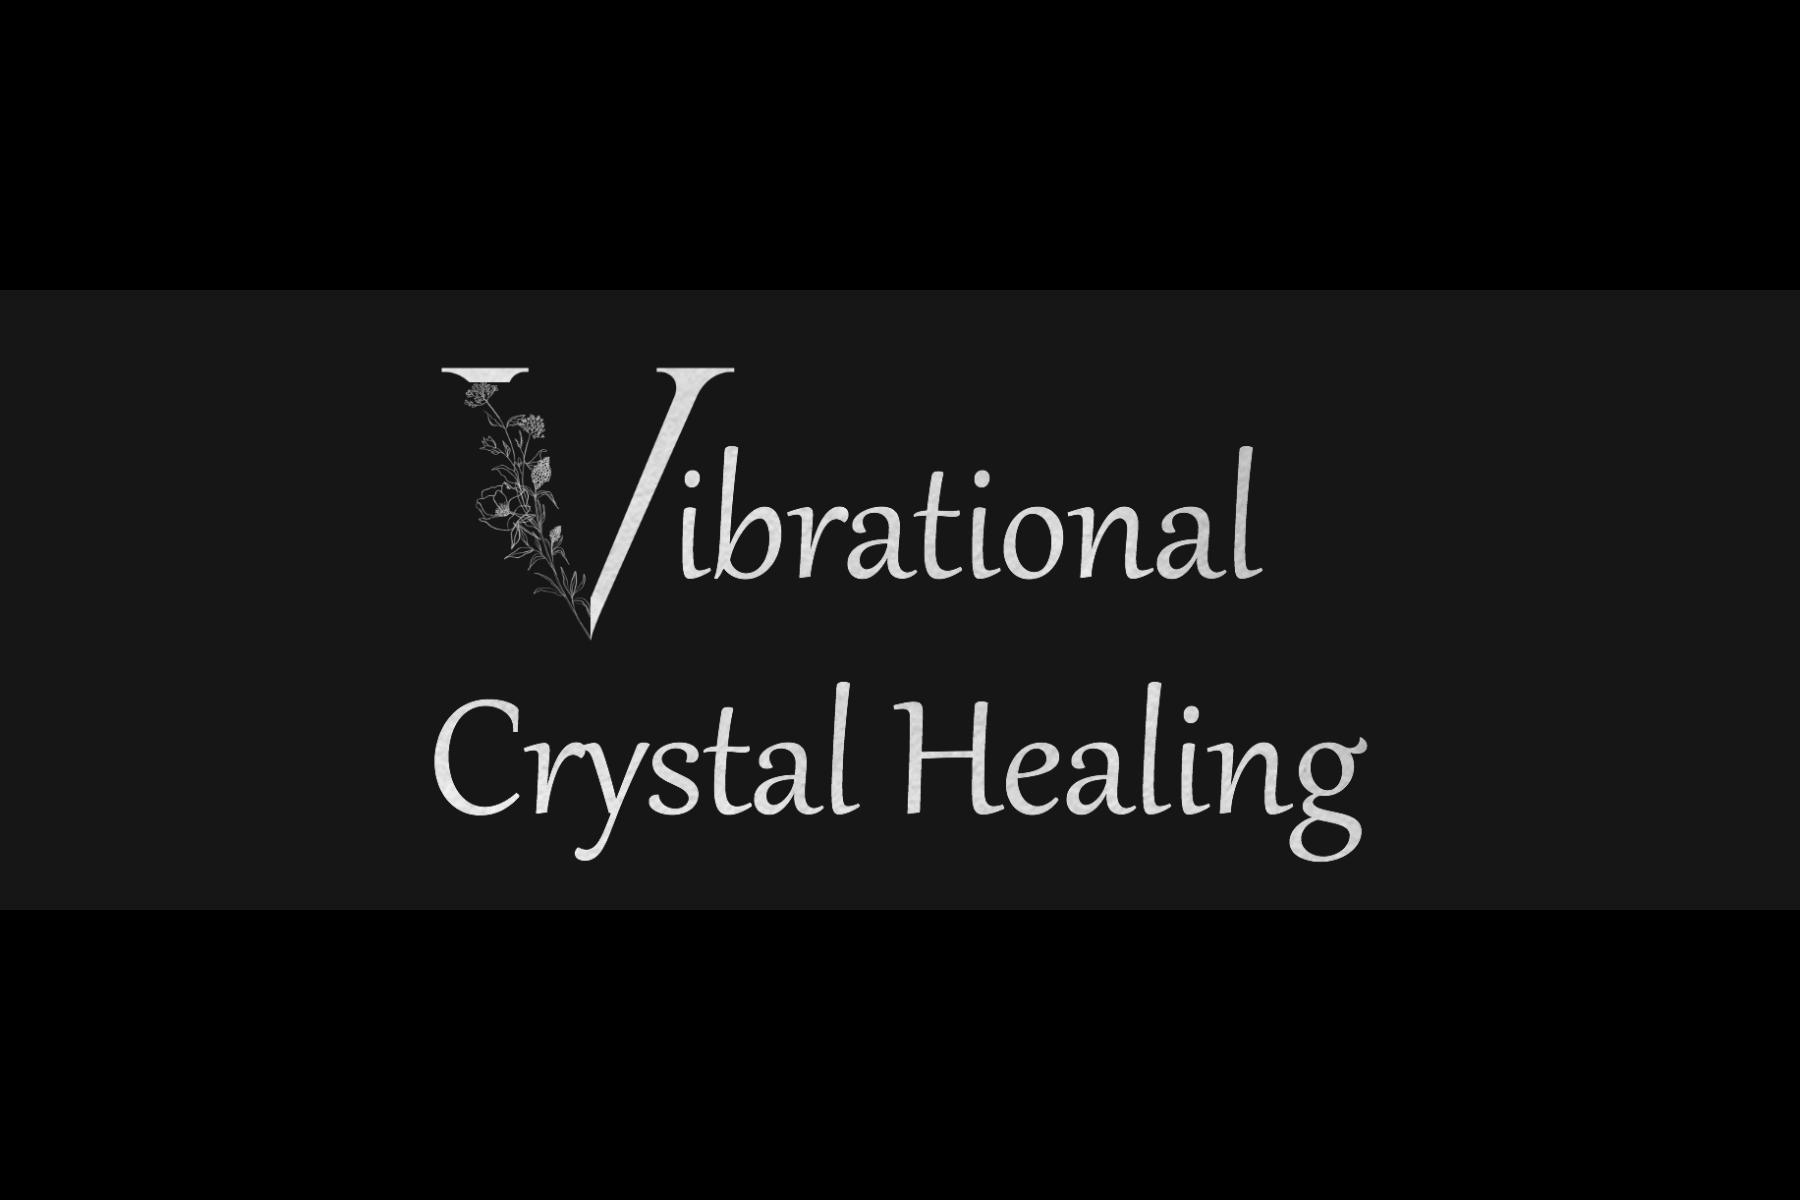 Vibrational Crystal Healing Of Moon And Sea